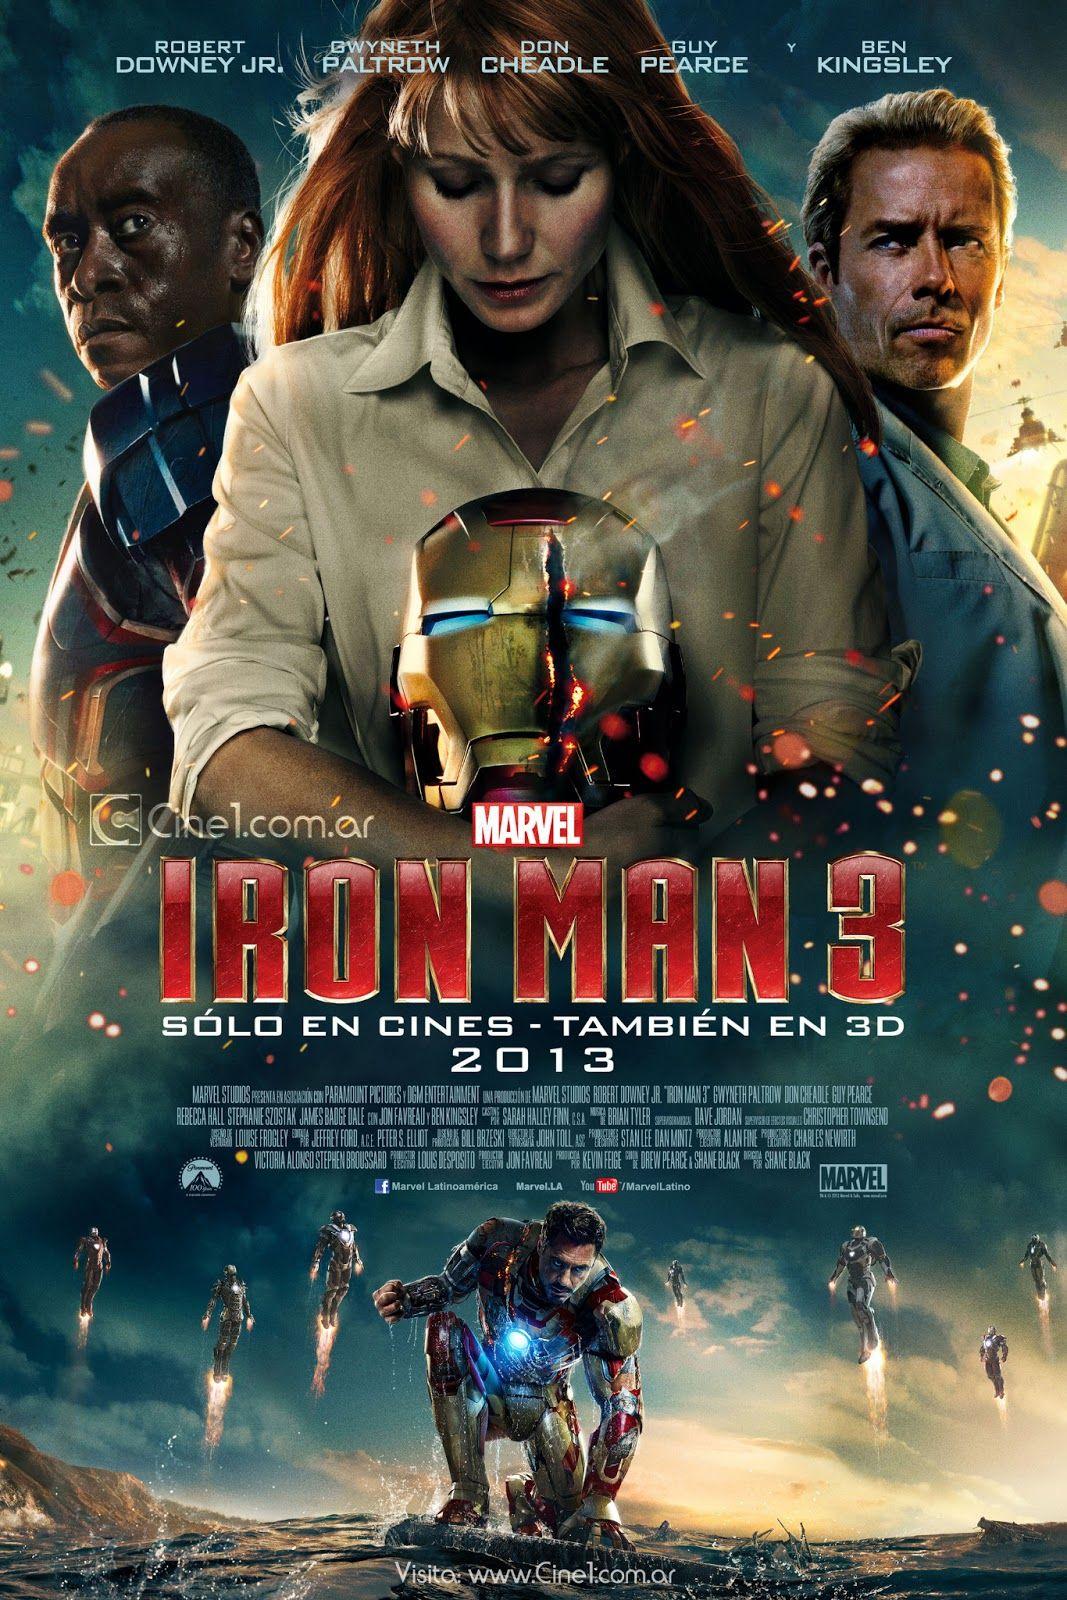 Orden Peliculas Marvel Iron Man 3